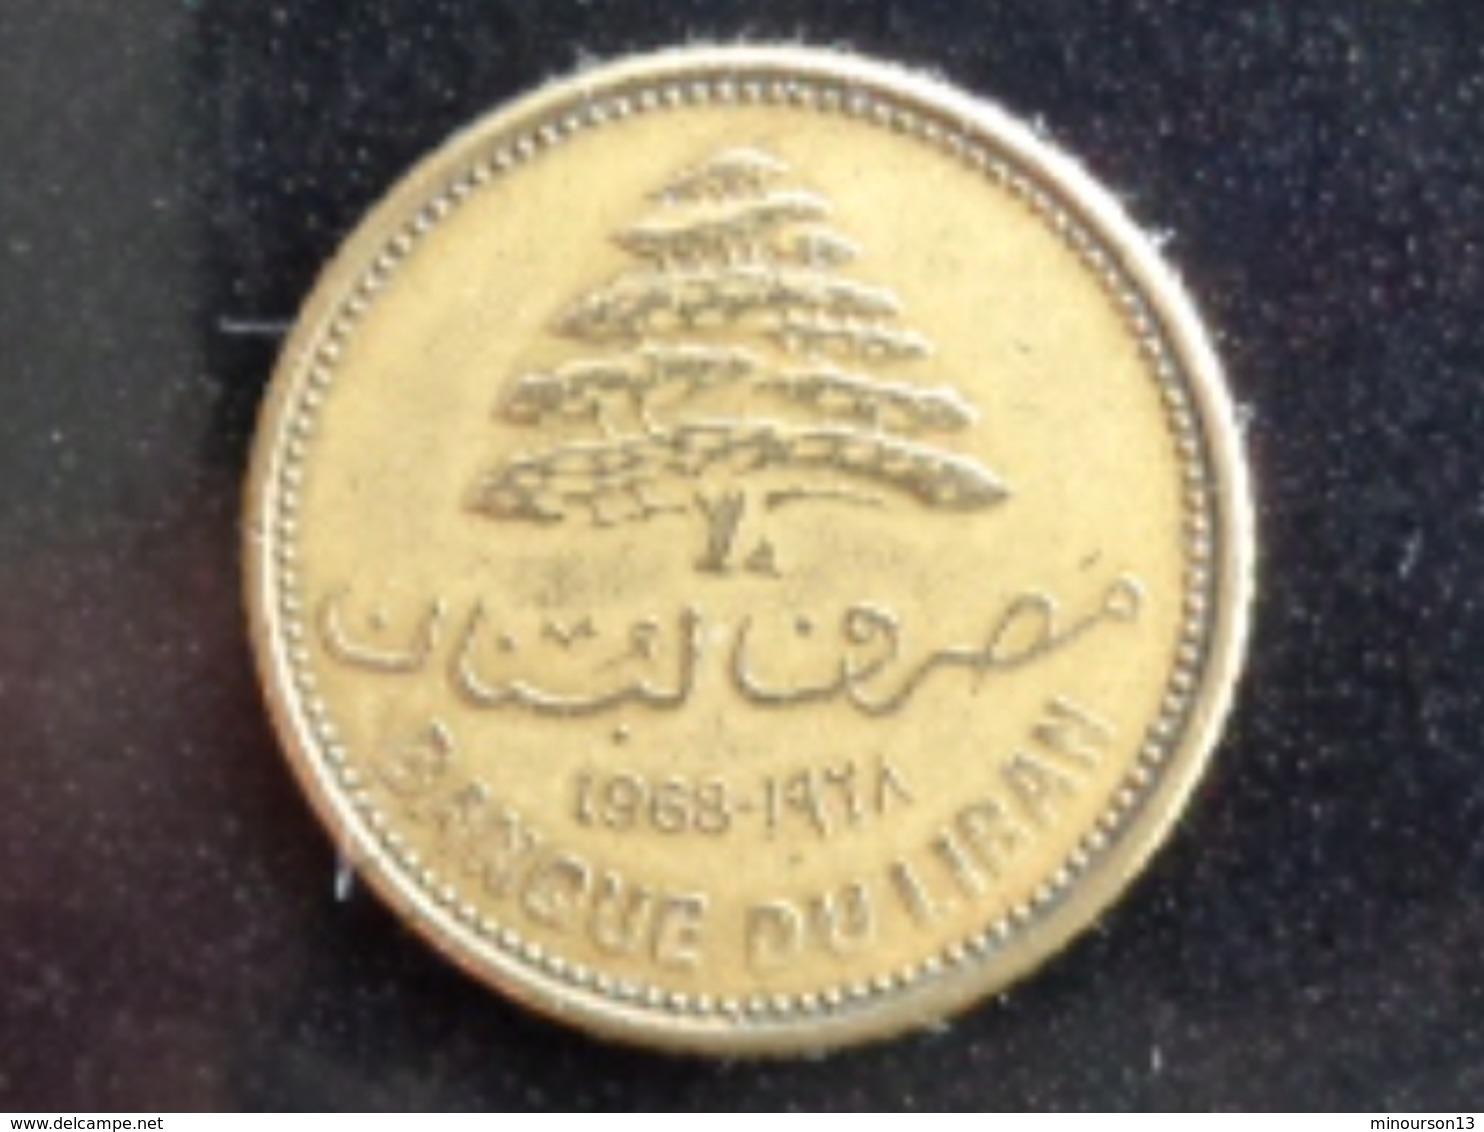 LIBAN TRES TRES BELLE 5 PIASTRES 1968 - Liban